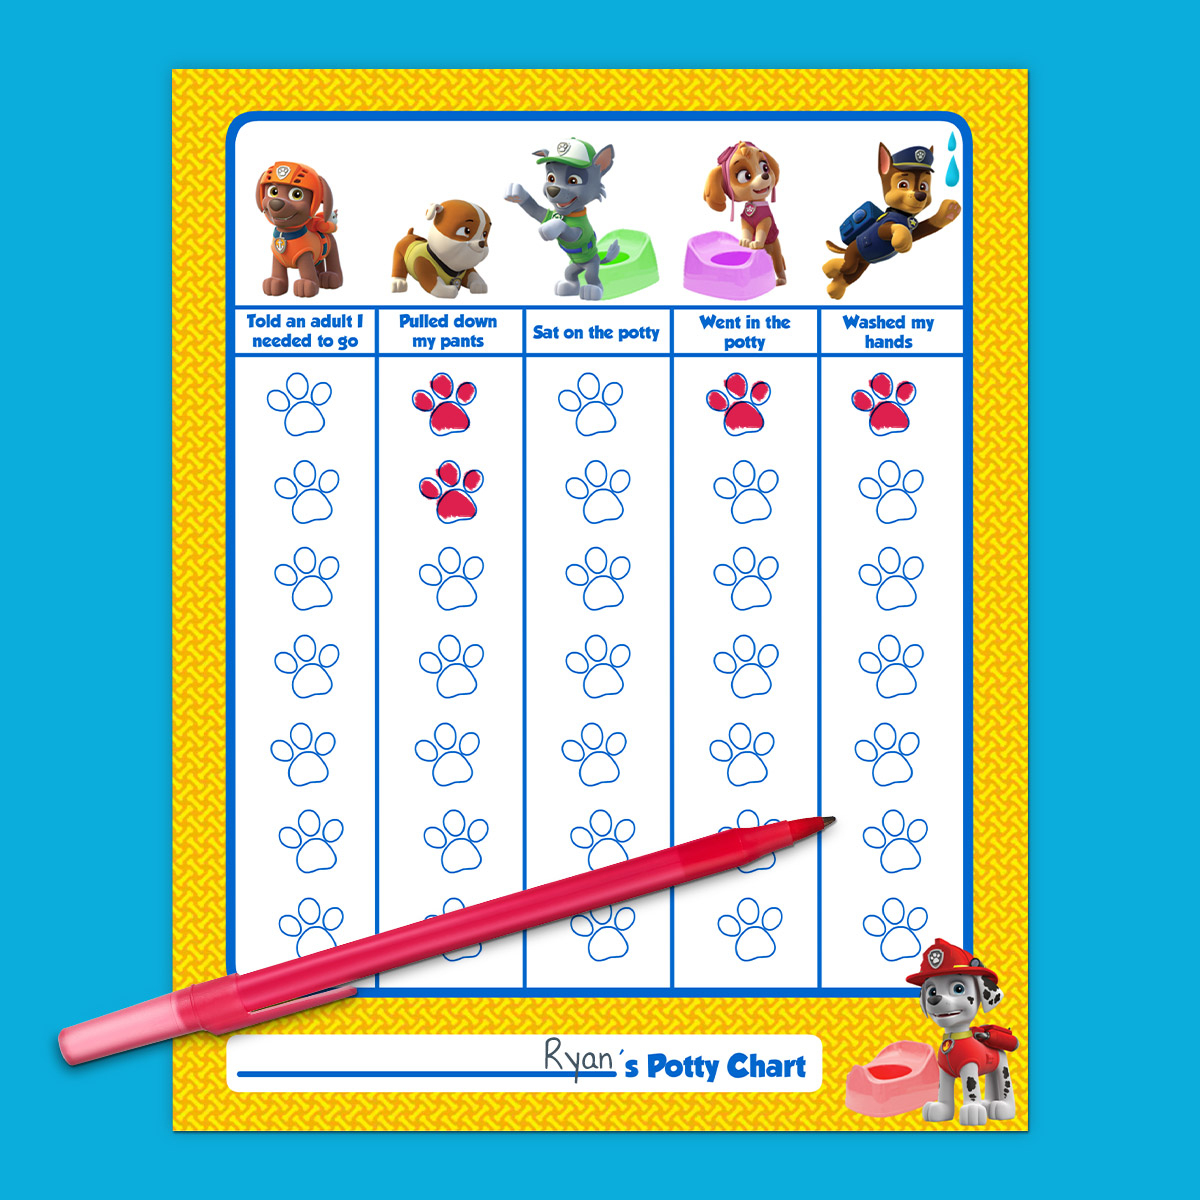 Paw Patrol Potty Training Chart   Nickelodeon Parents - Free Printable Potty Training Charts